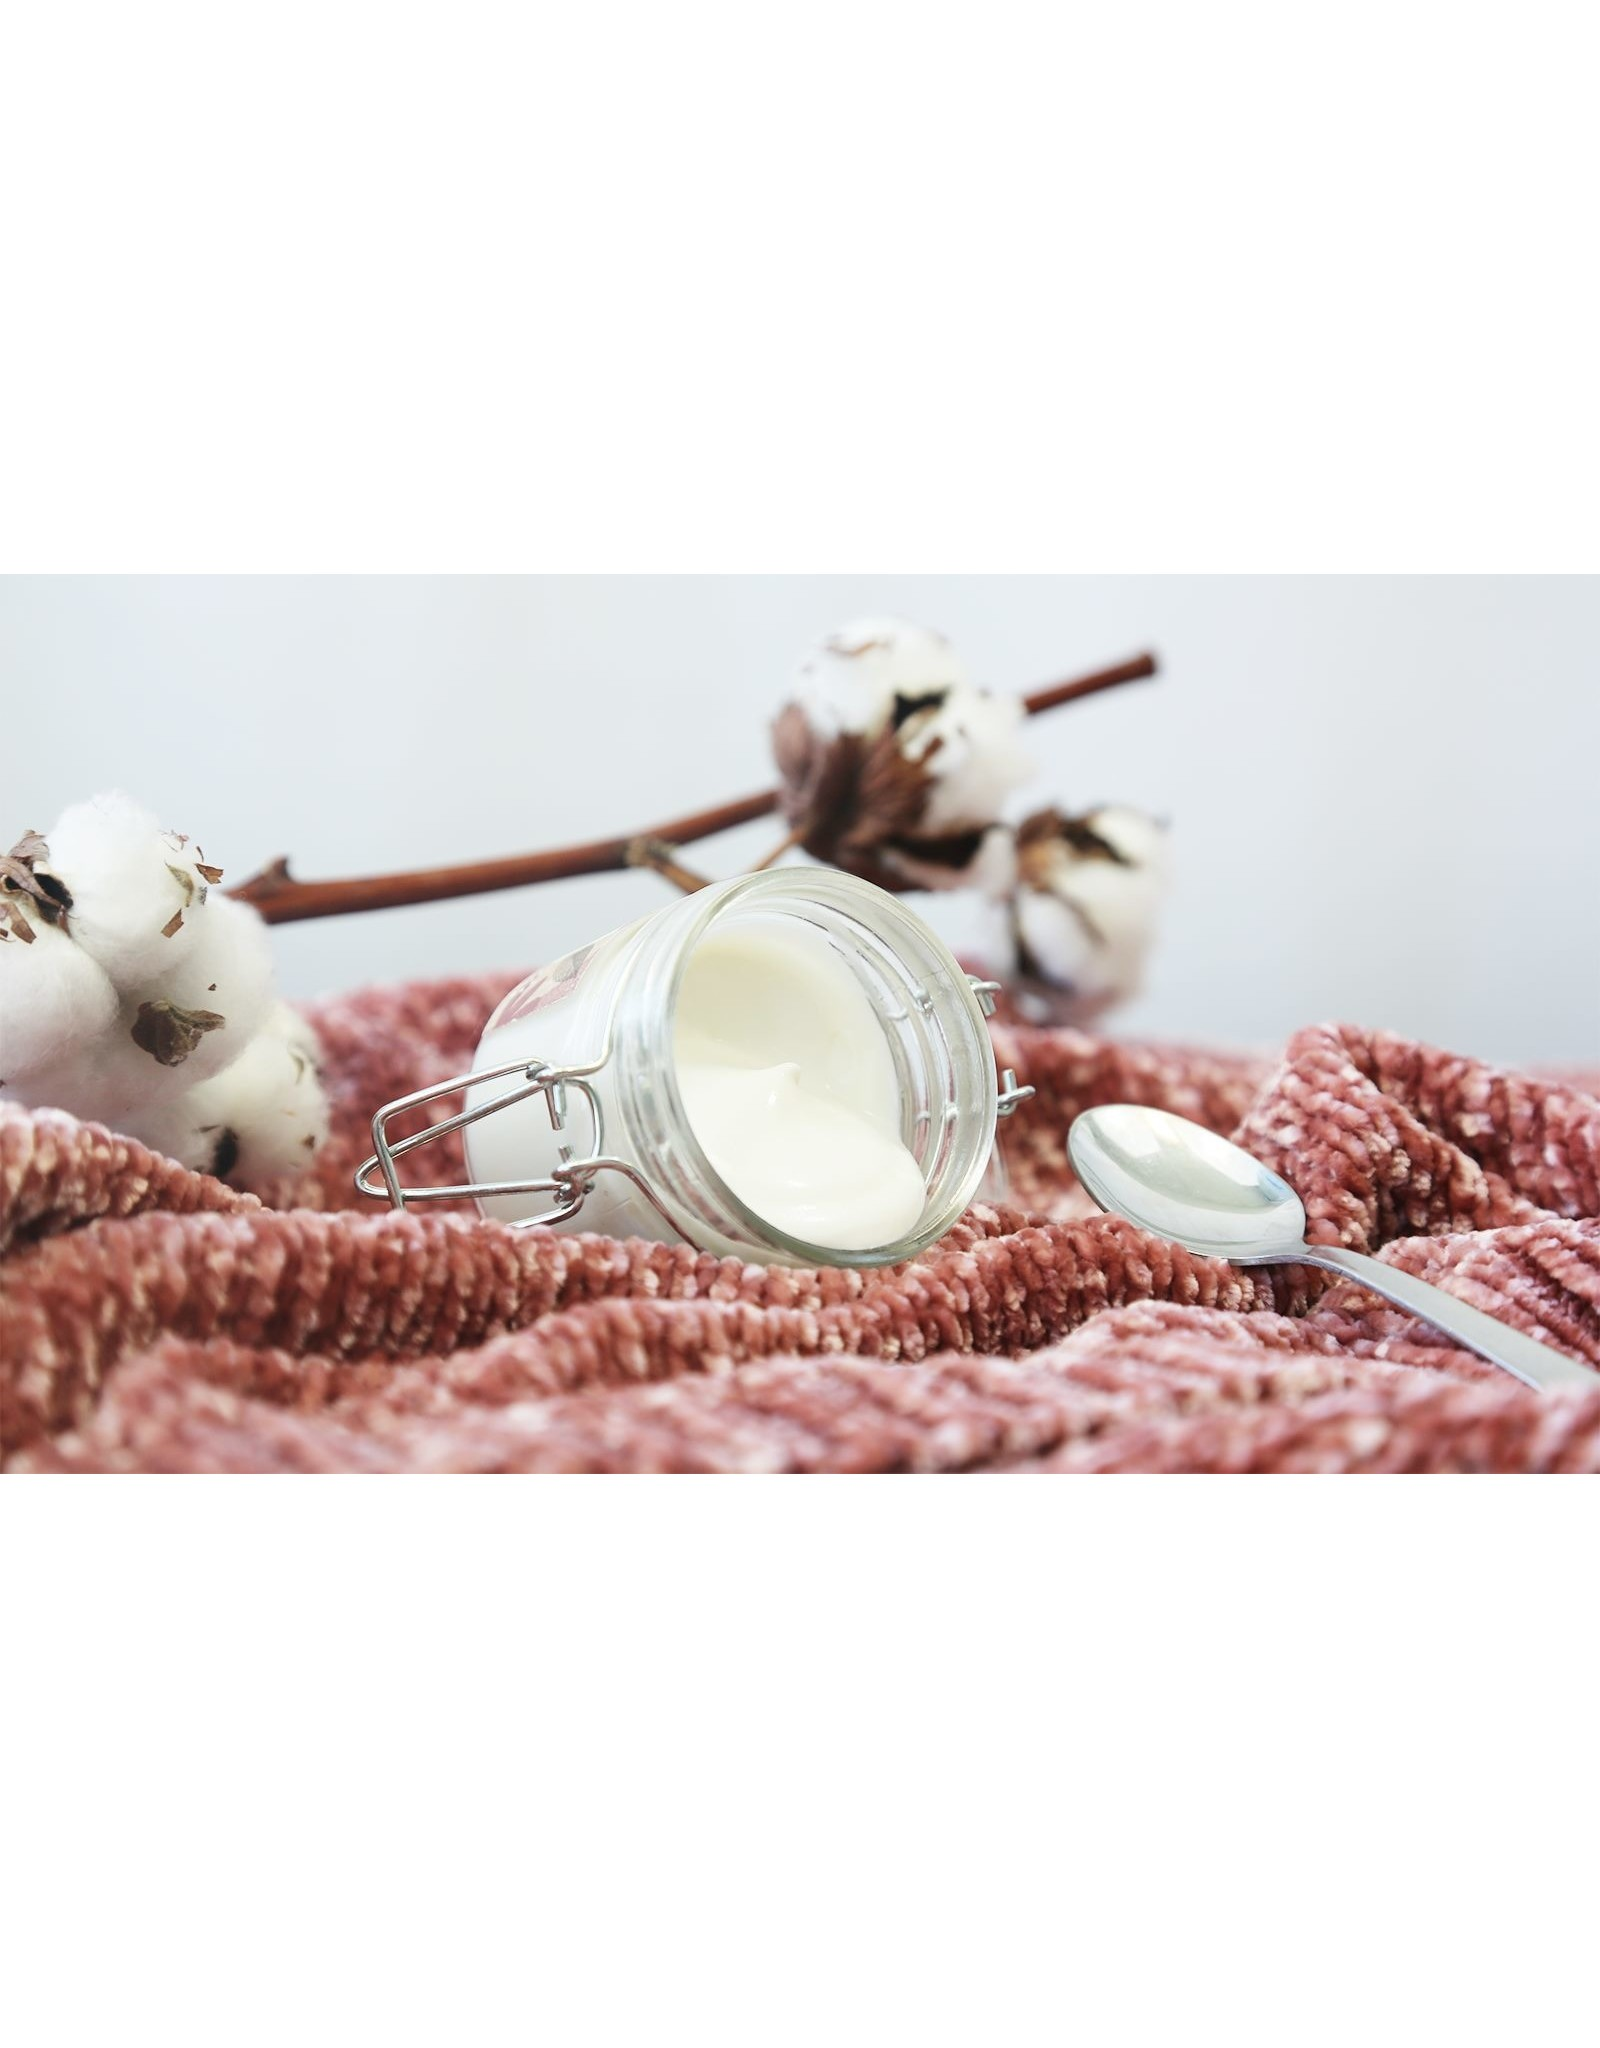 ENDRO crème corps fleur de coton